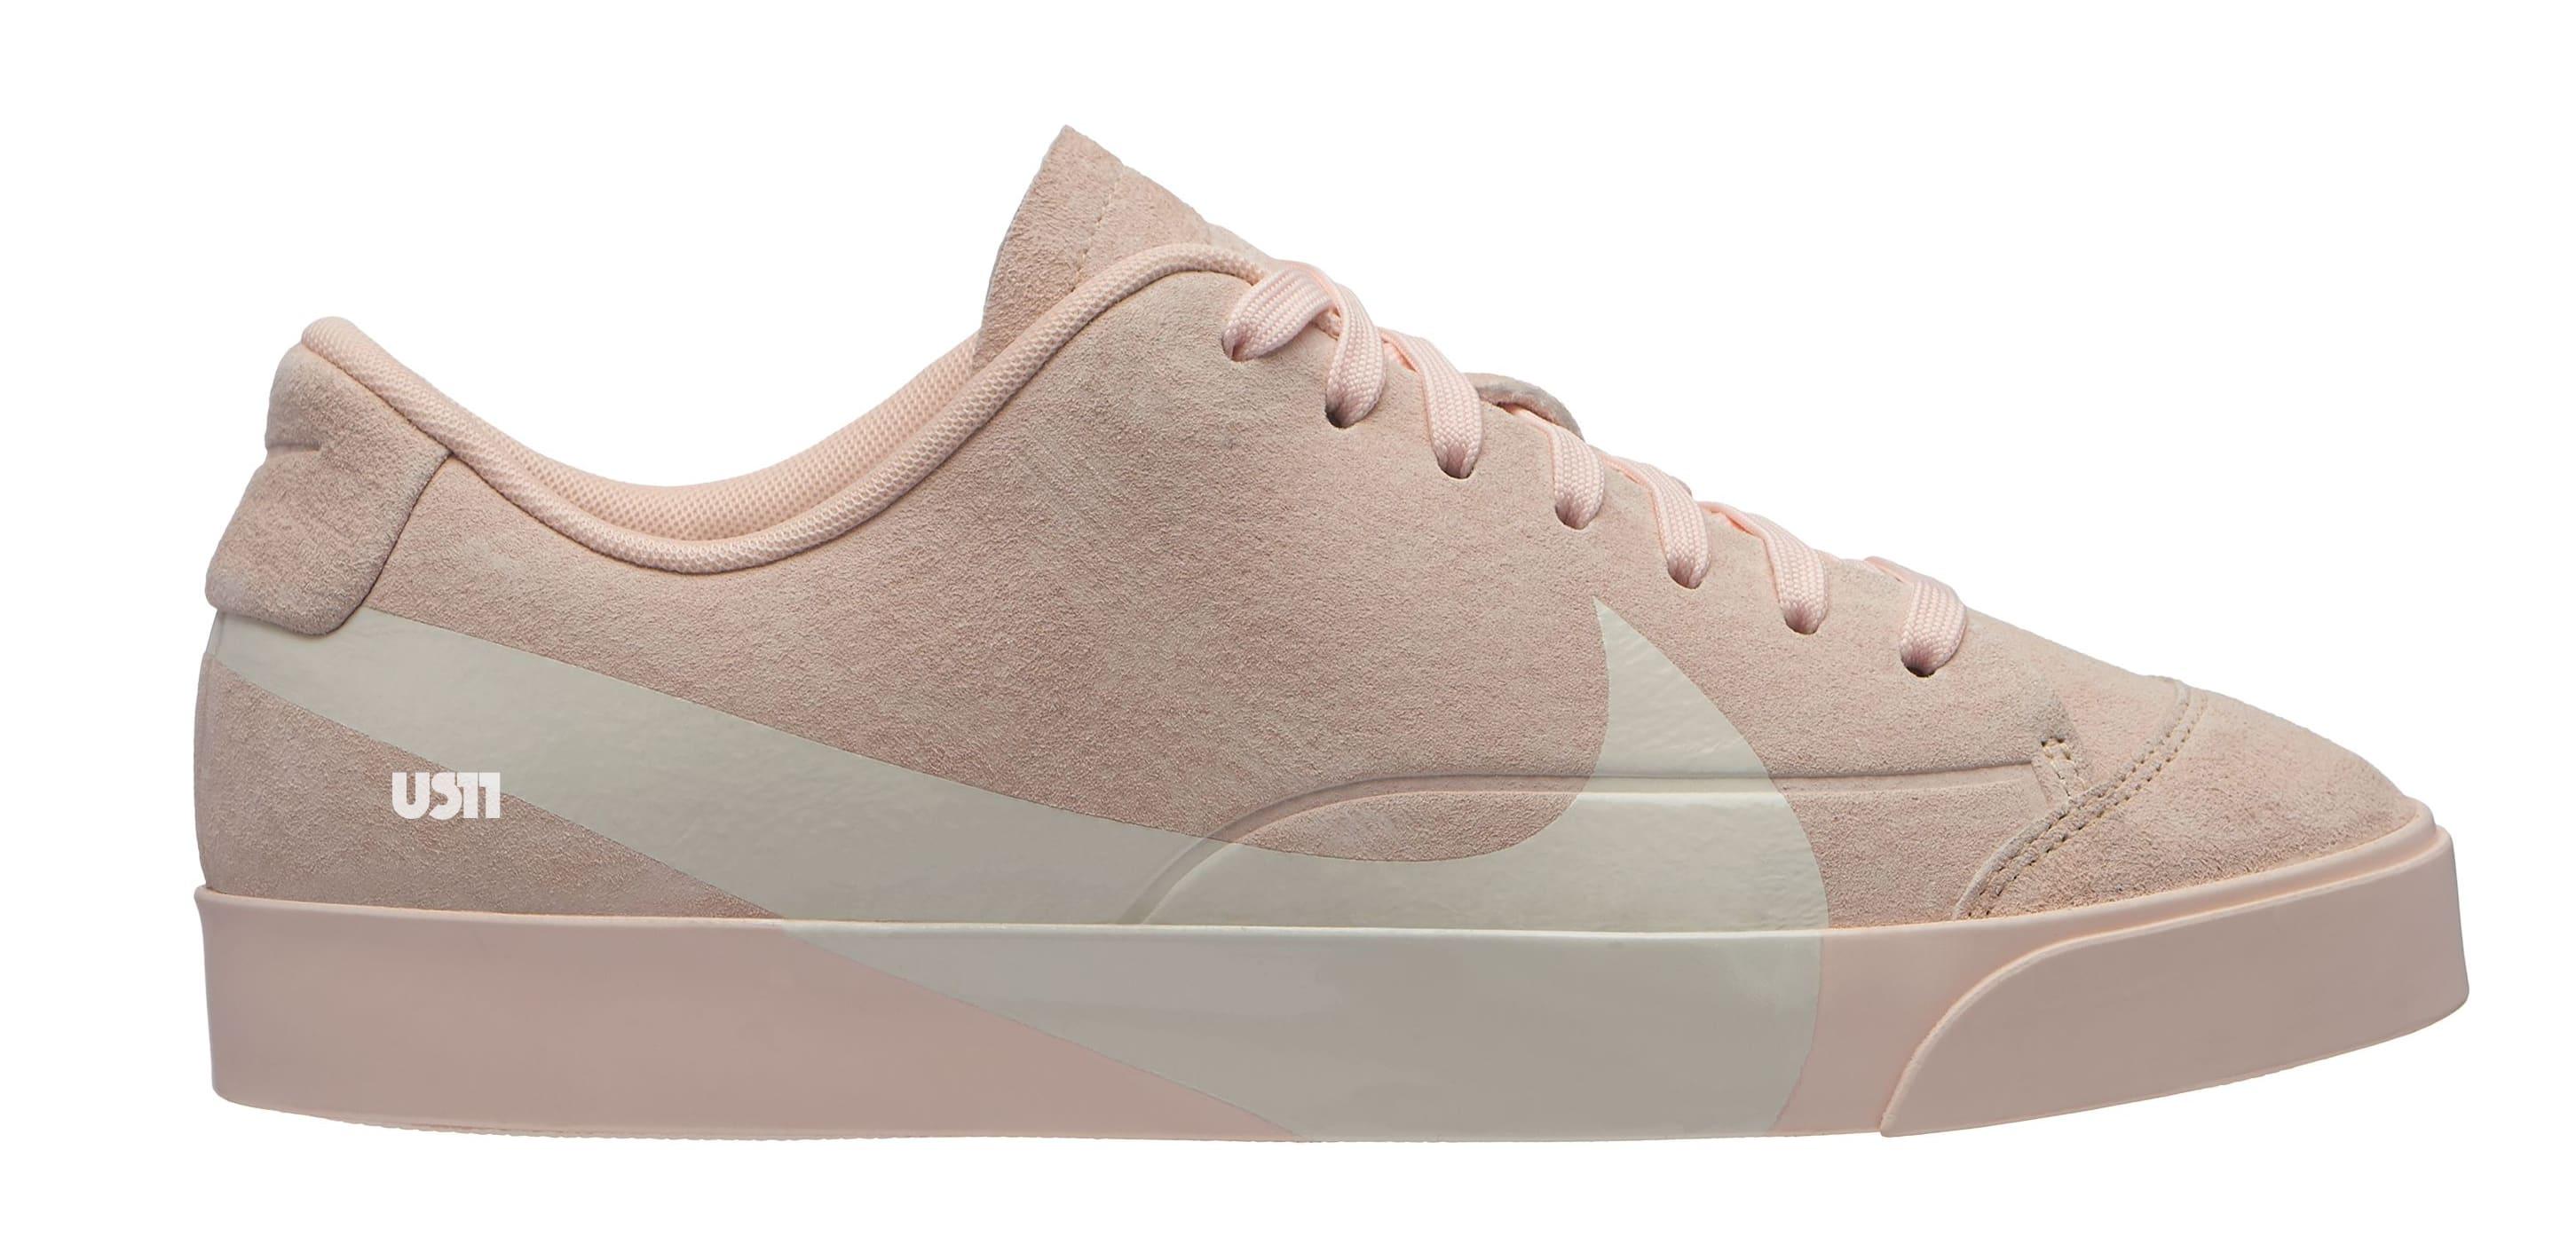 Nike Blazer City Low XS 'Pink' (Lateral)